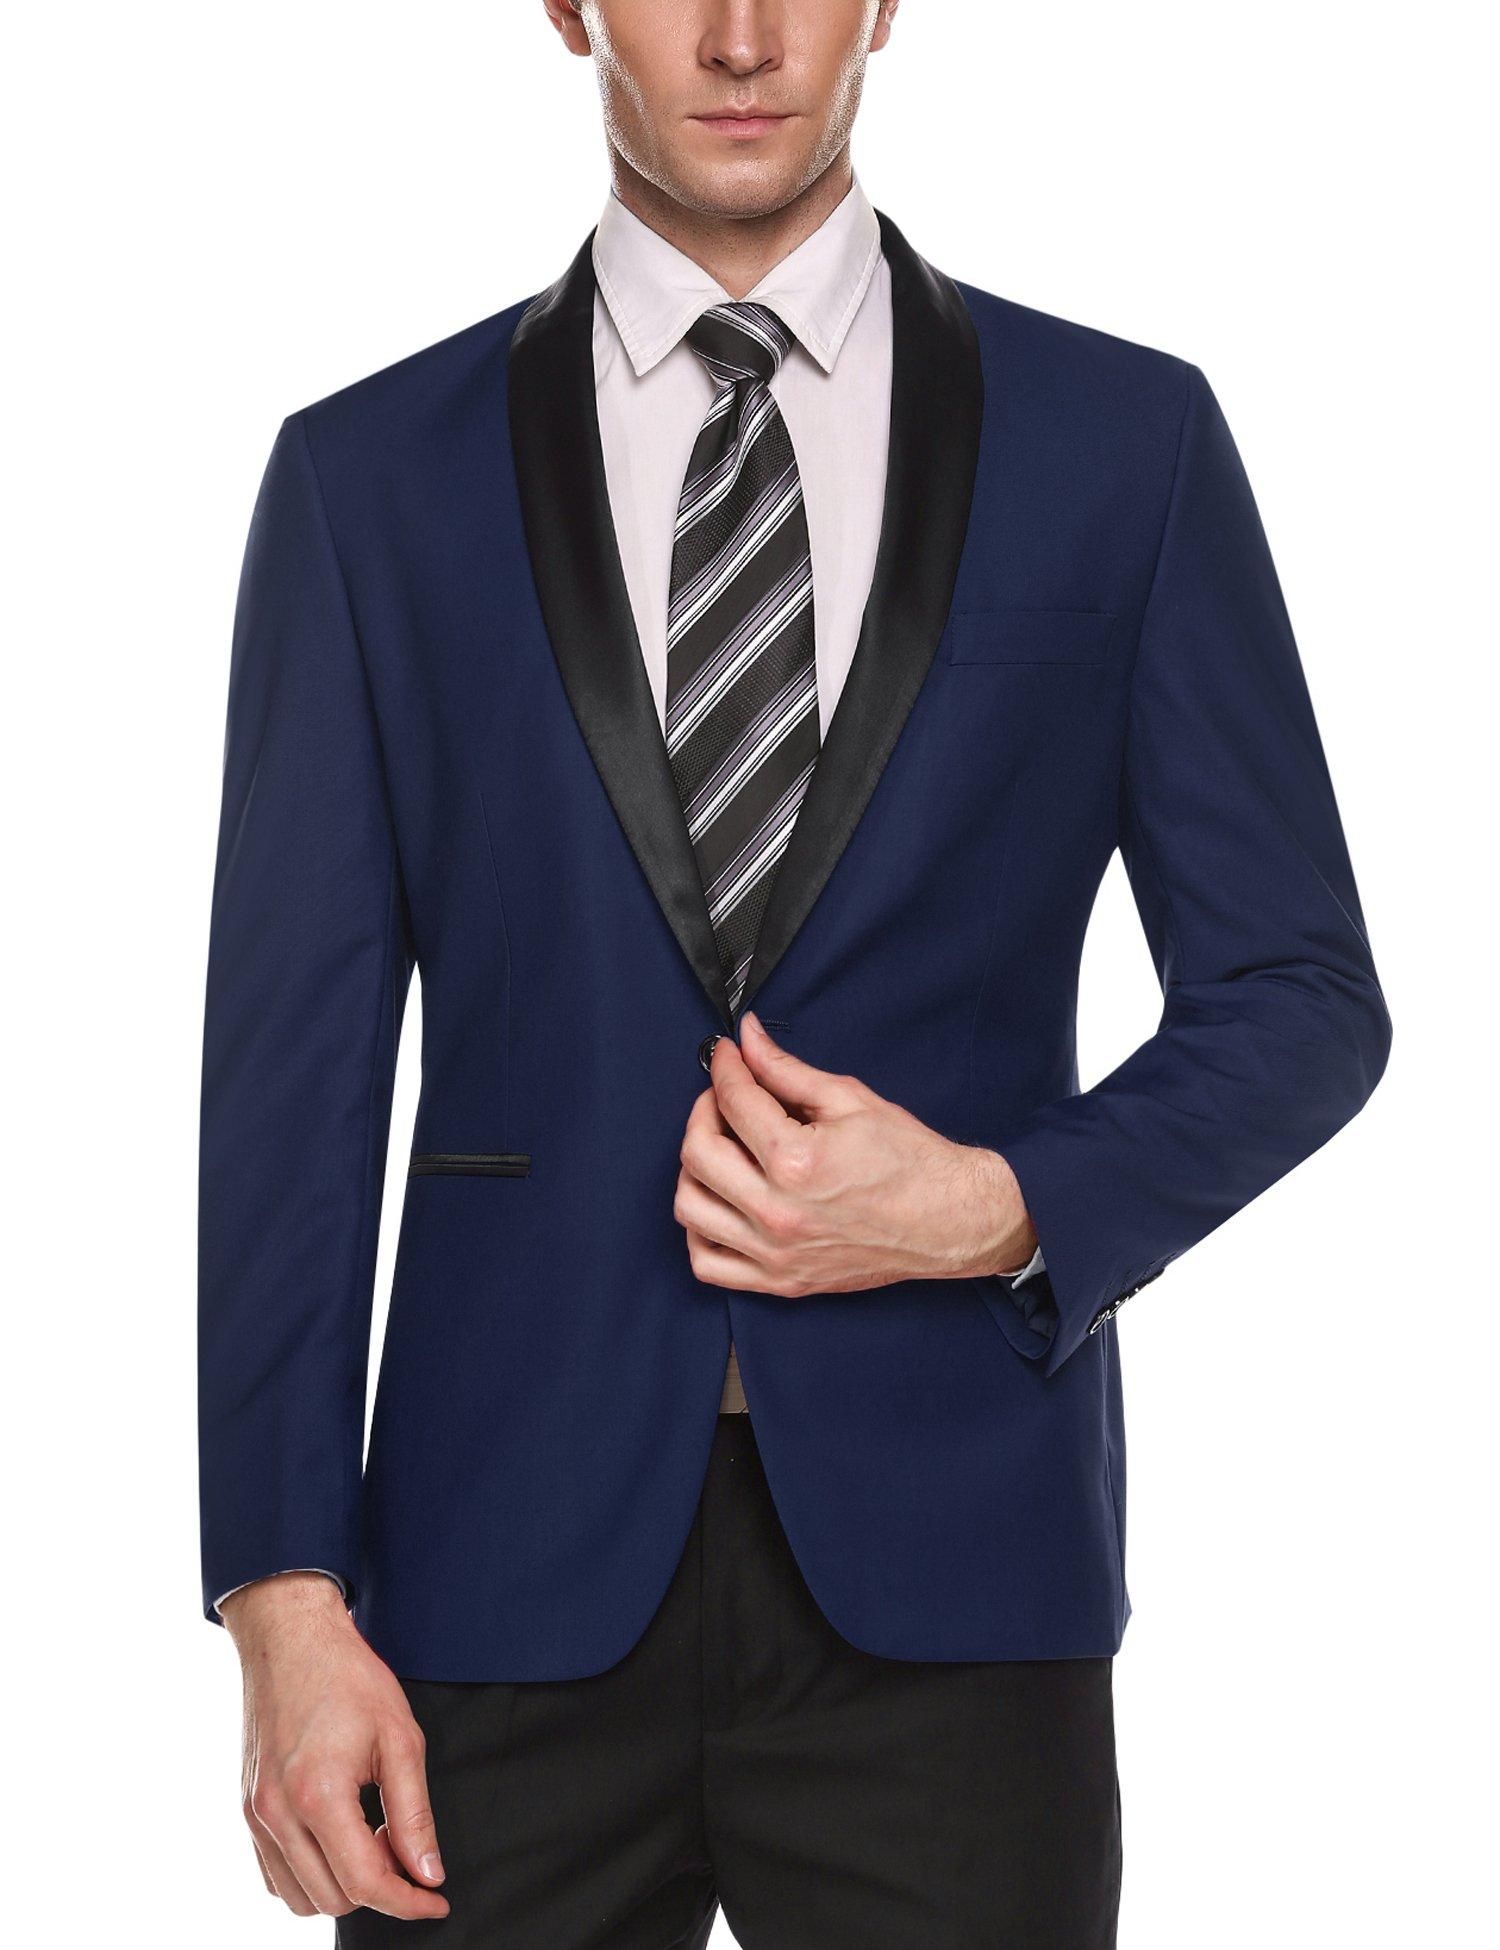 COOFANDY Men's Slim Fit Blazer Jacket Casual One Button Suit Coat by COOFANDY (Image #2)